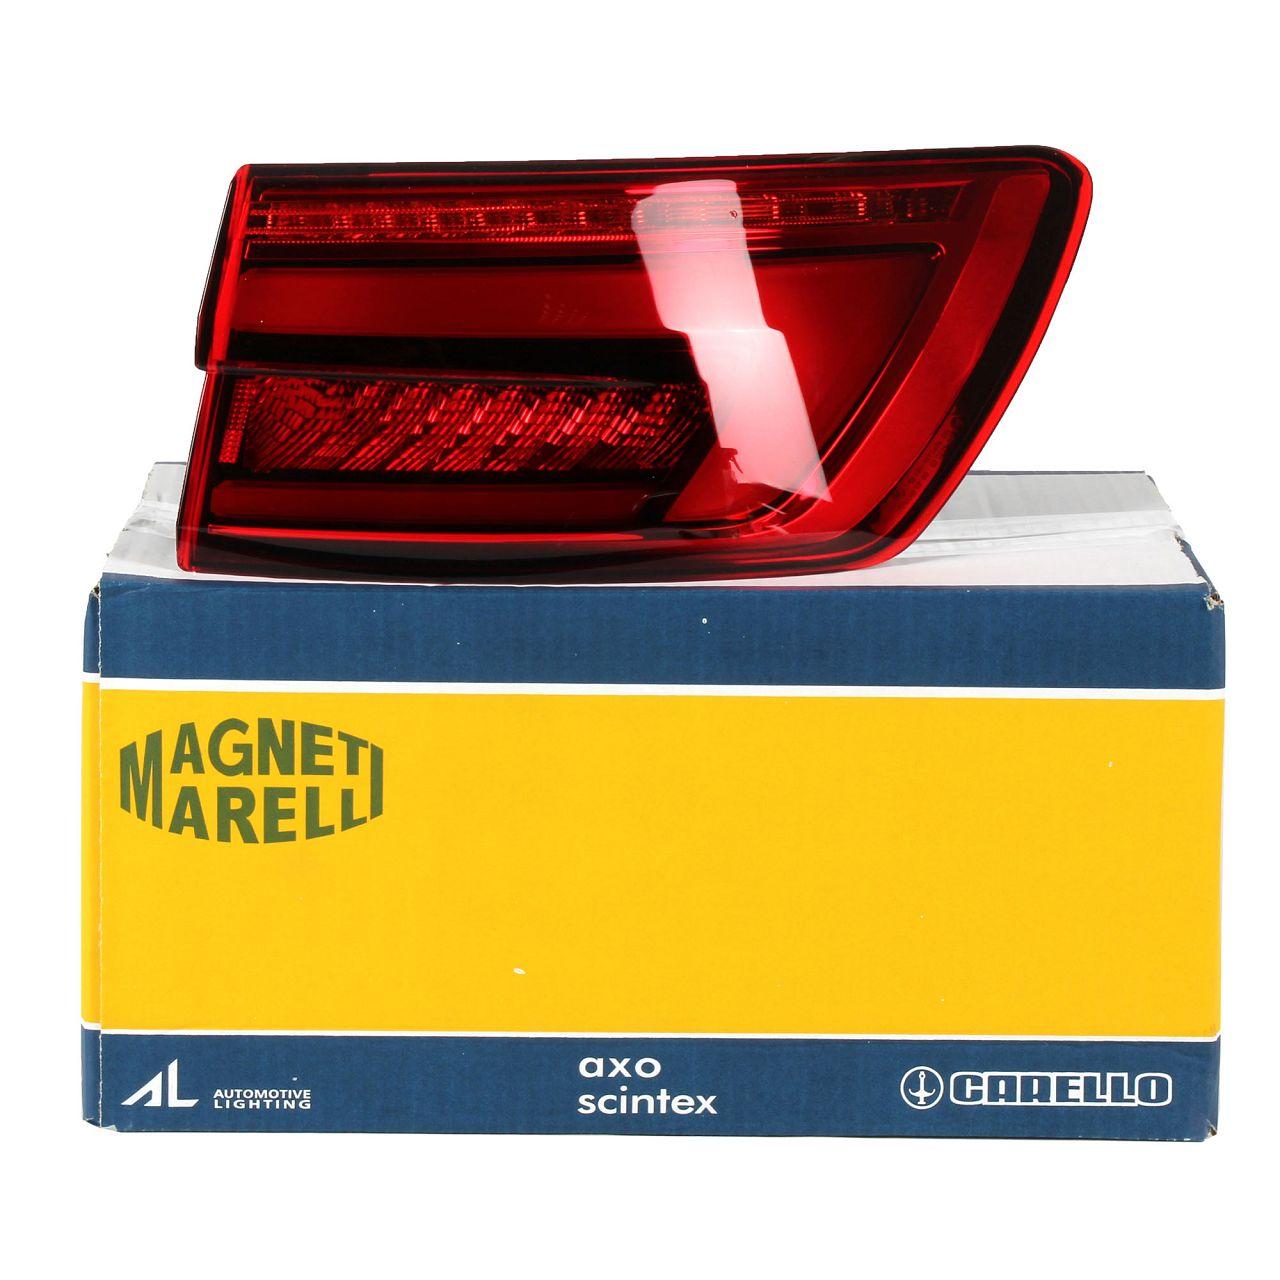 MAGNETI MARELLI Heckleuchte LED für AUDI A4 AVANT (8W5 B9) AUSSEN RECHTS